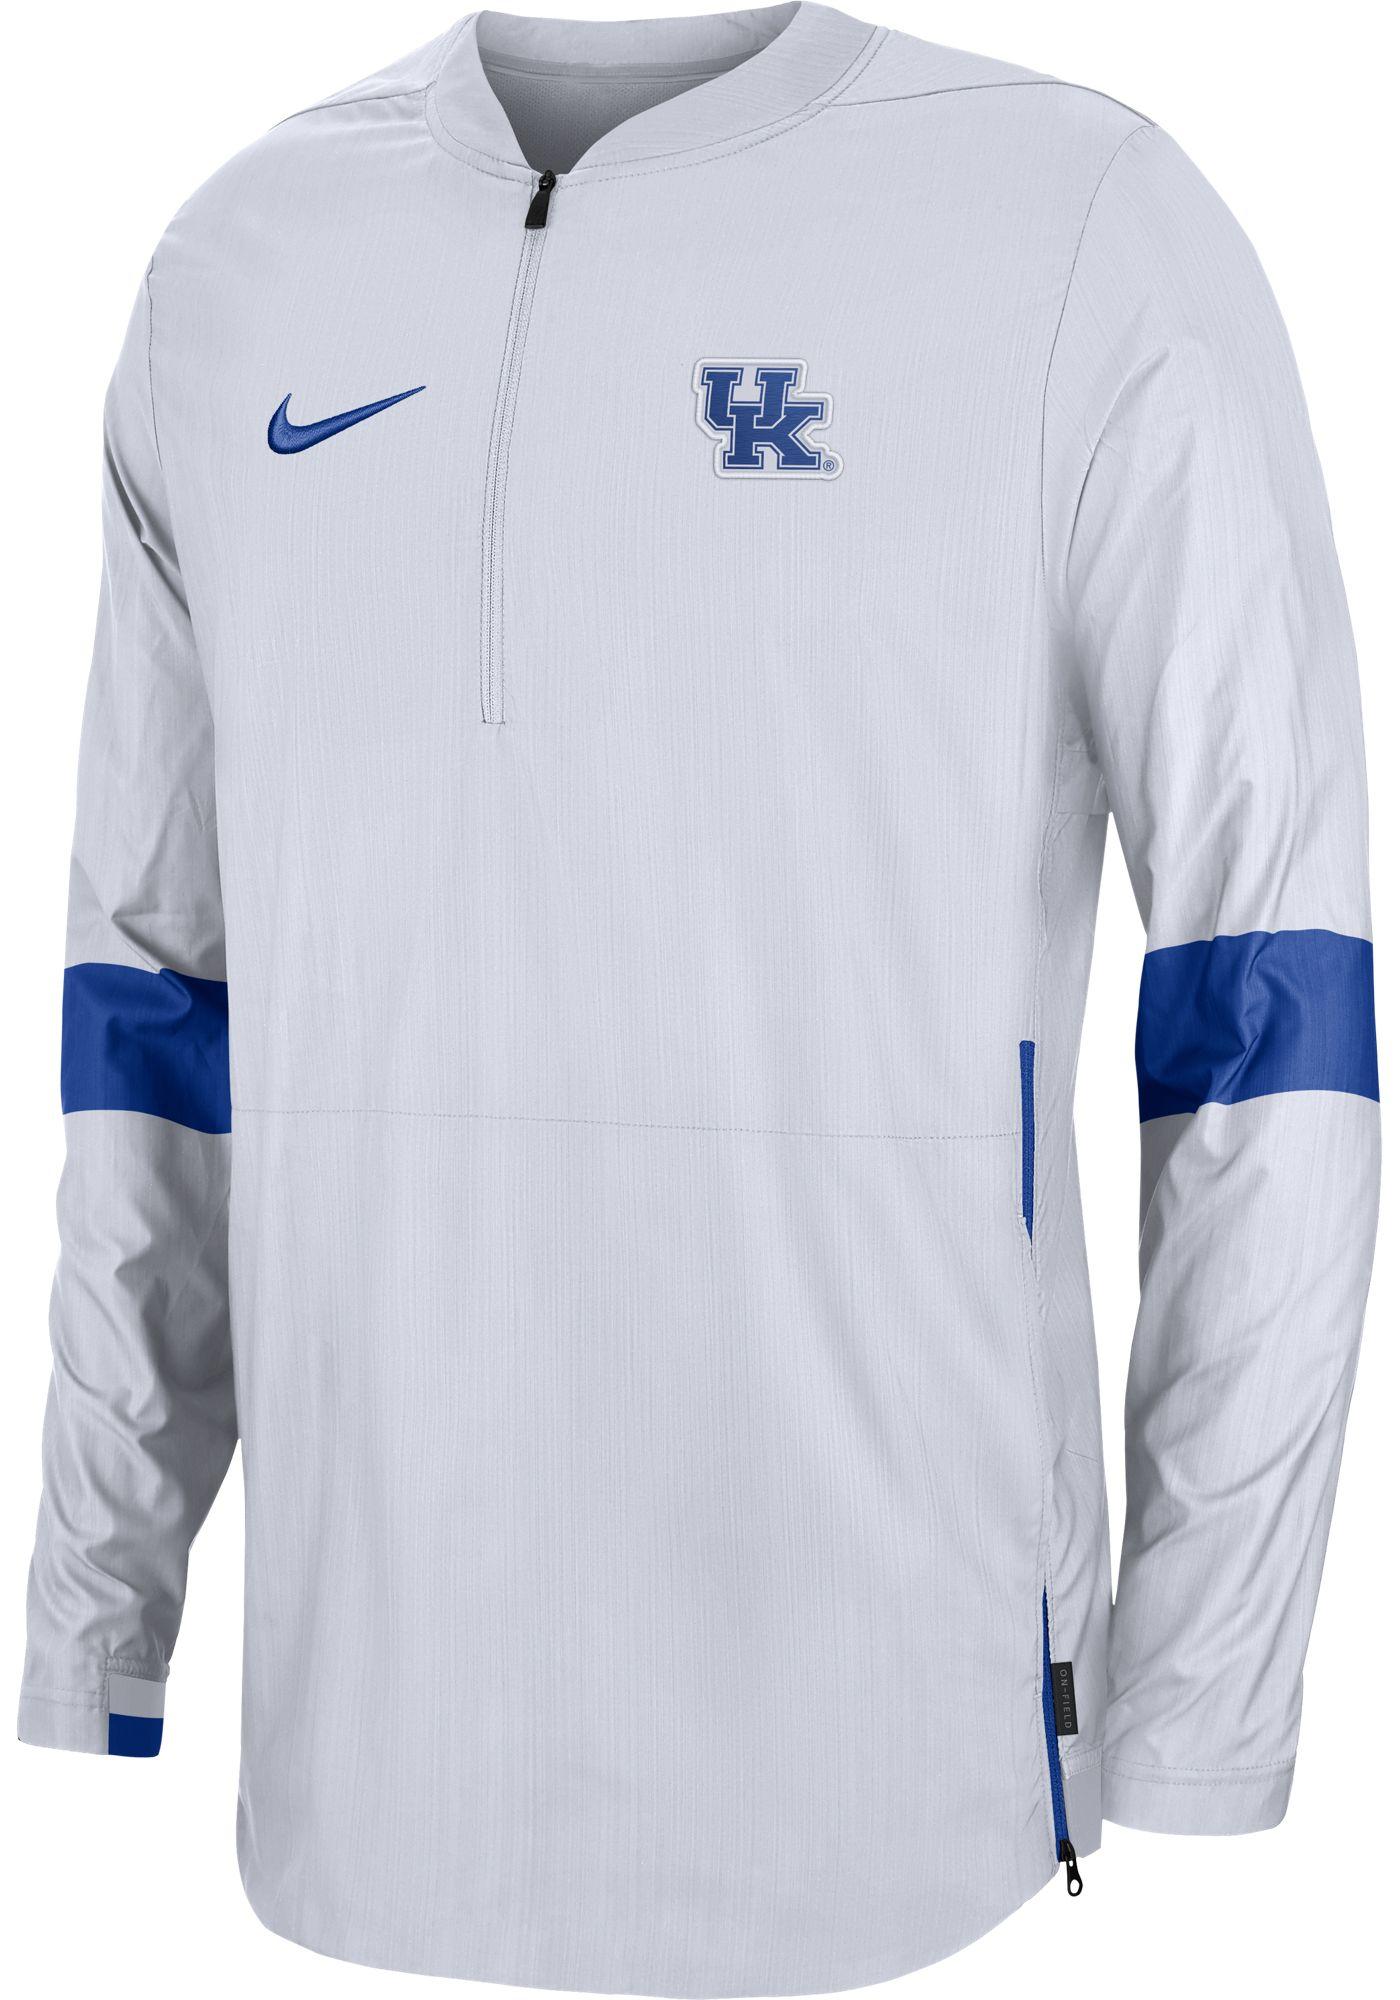 Nike Men's Kentucky Wildcats Lockdown Half-Zip Football White Jacket